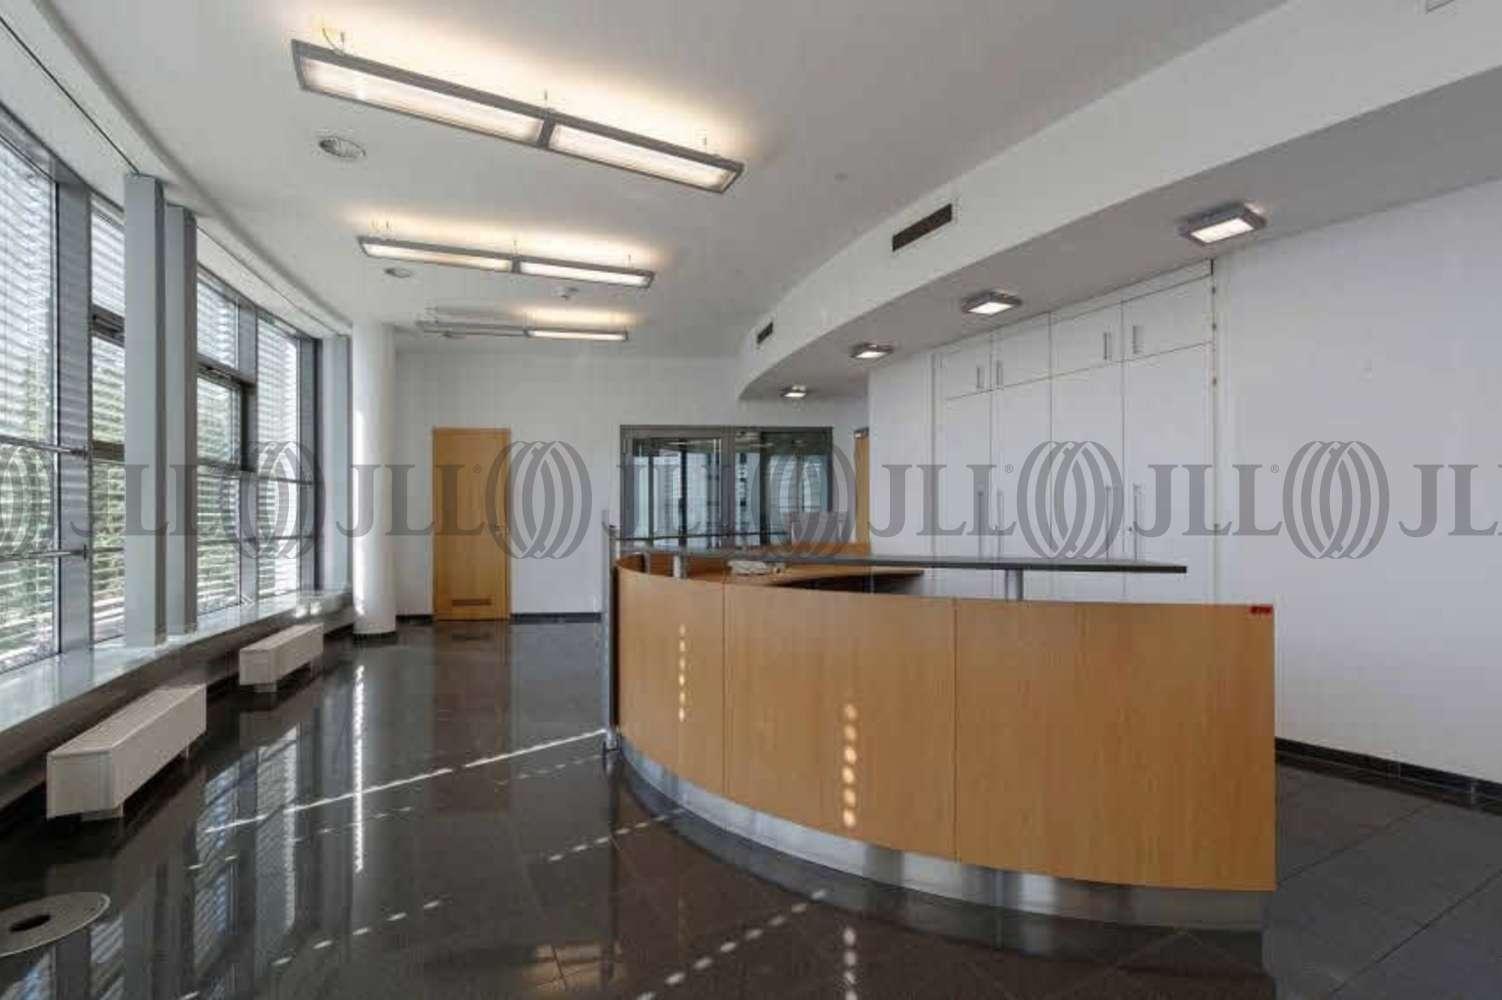 Büros Frankfurt am main, 60598 - Büro - Frankfurt am Main, Sachsenhausen - F1445 - 9417146